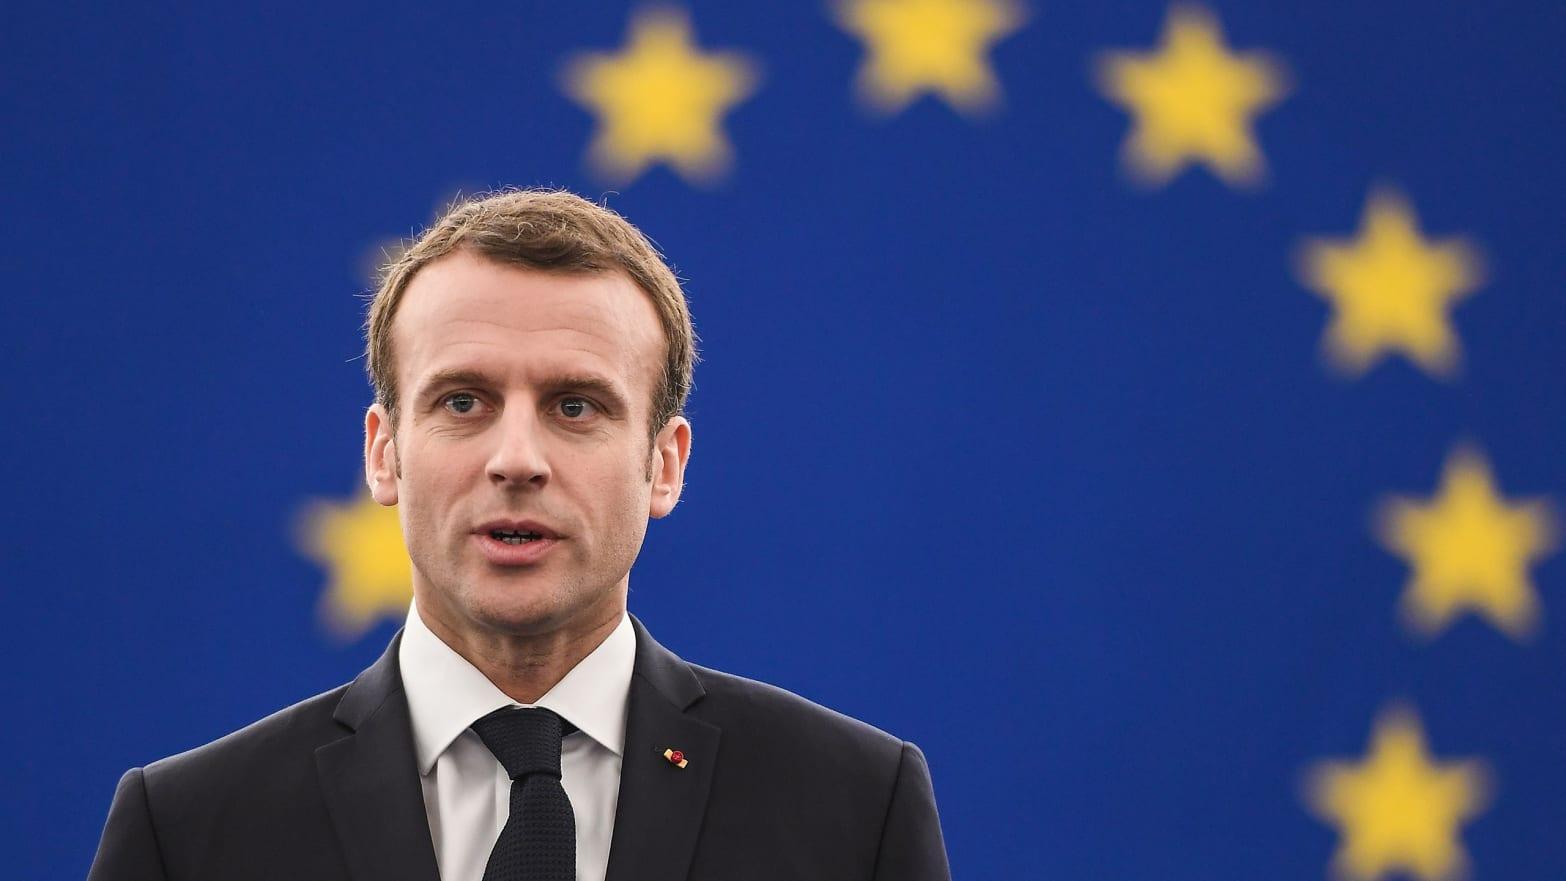 Frenemies? Polarizing Donald Trump vs. The Ruthless Centrism of Emmanuel Macron